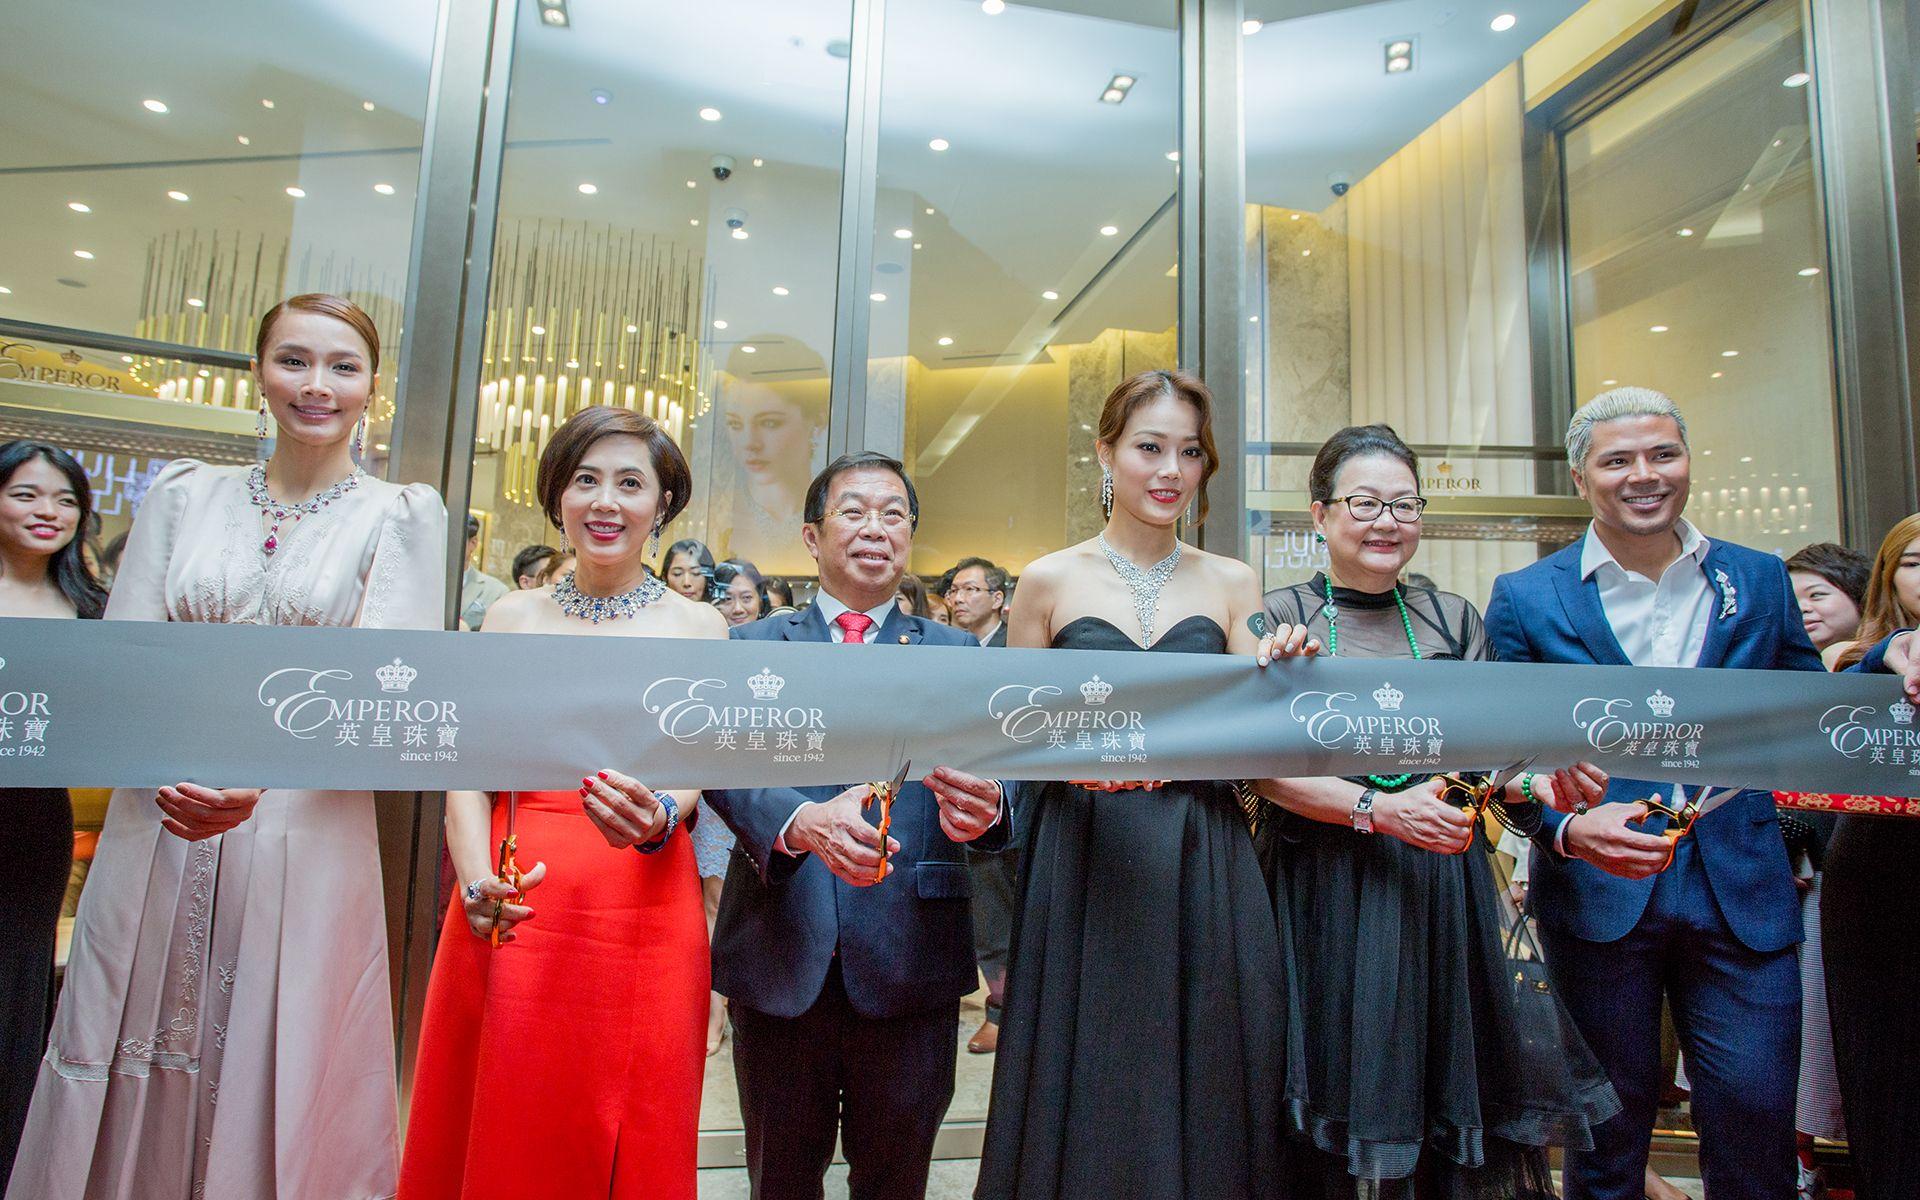 Scha Alyahya, Cindy Yeung, Tan Kok Wai, Joey Yung, Dato' Joyce Yap and Awal Ashaari